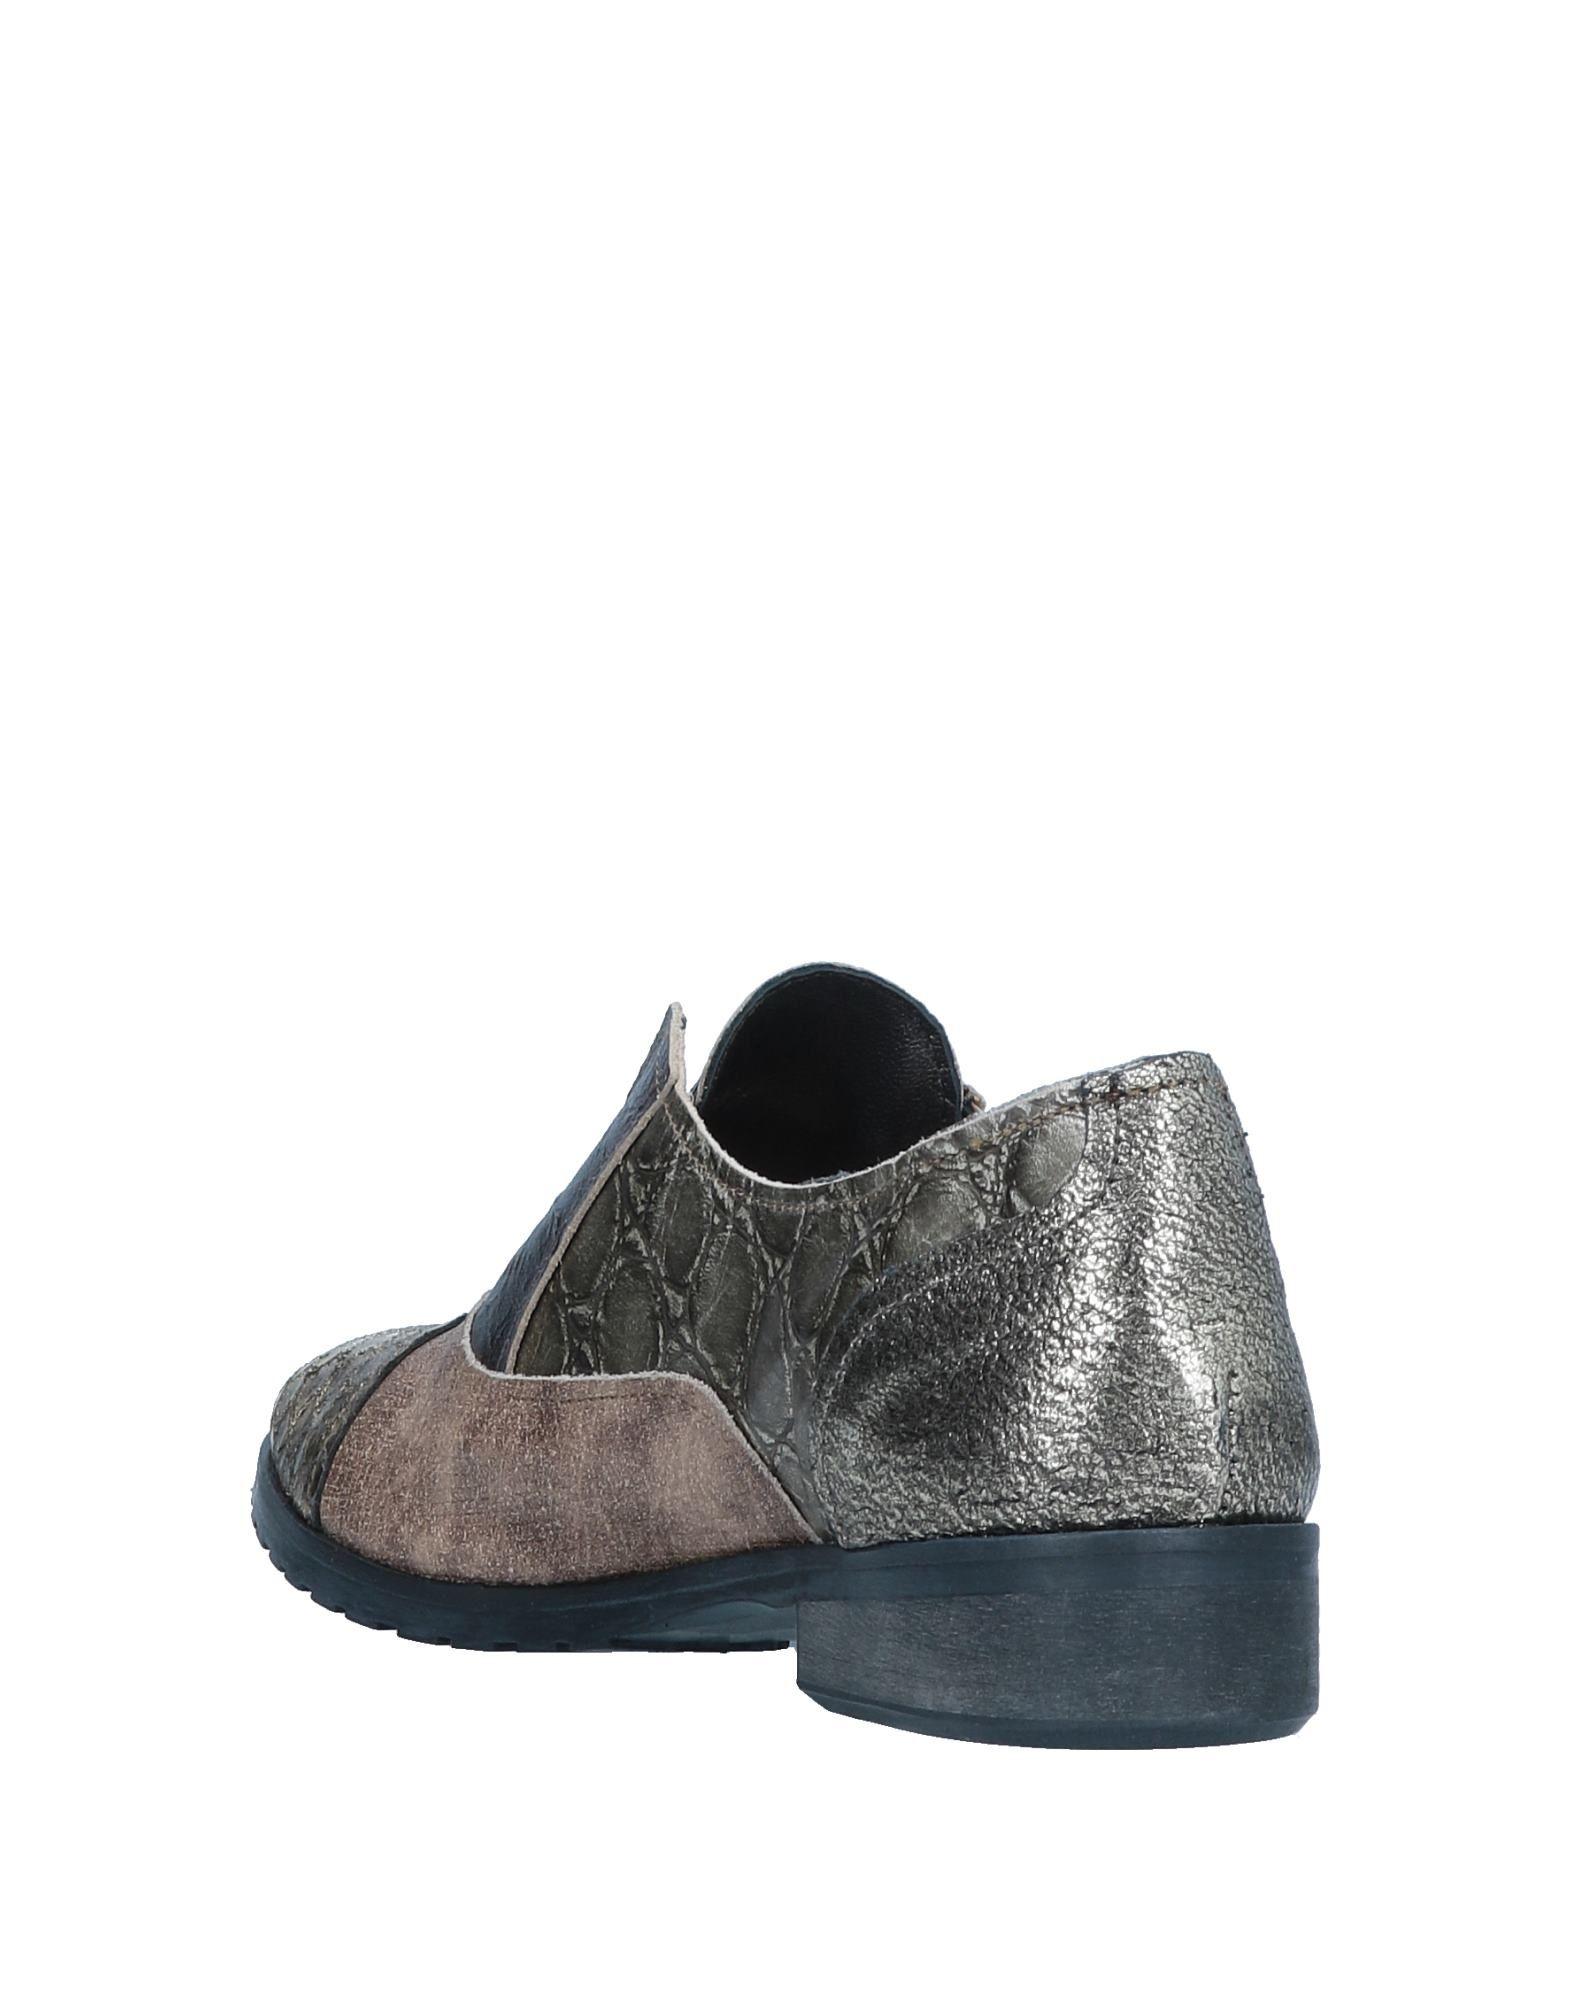 Ebarrito Mokassins Damen beliebte  11552107UR Gute Qualität beliebte Damen Schuhe 0bf4db